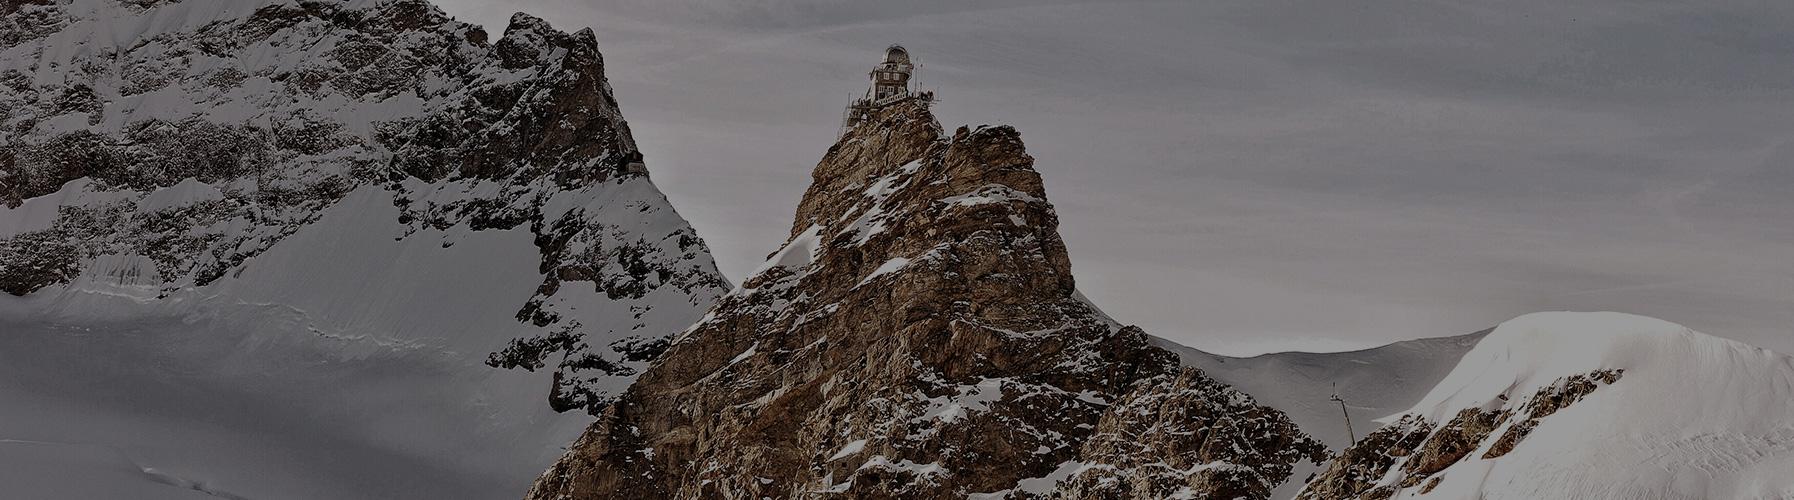 Backcountry Esquí